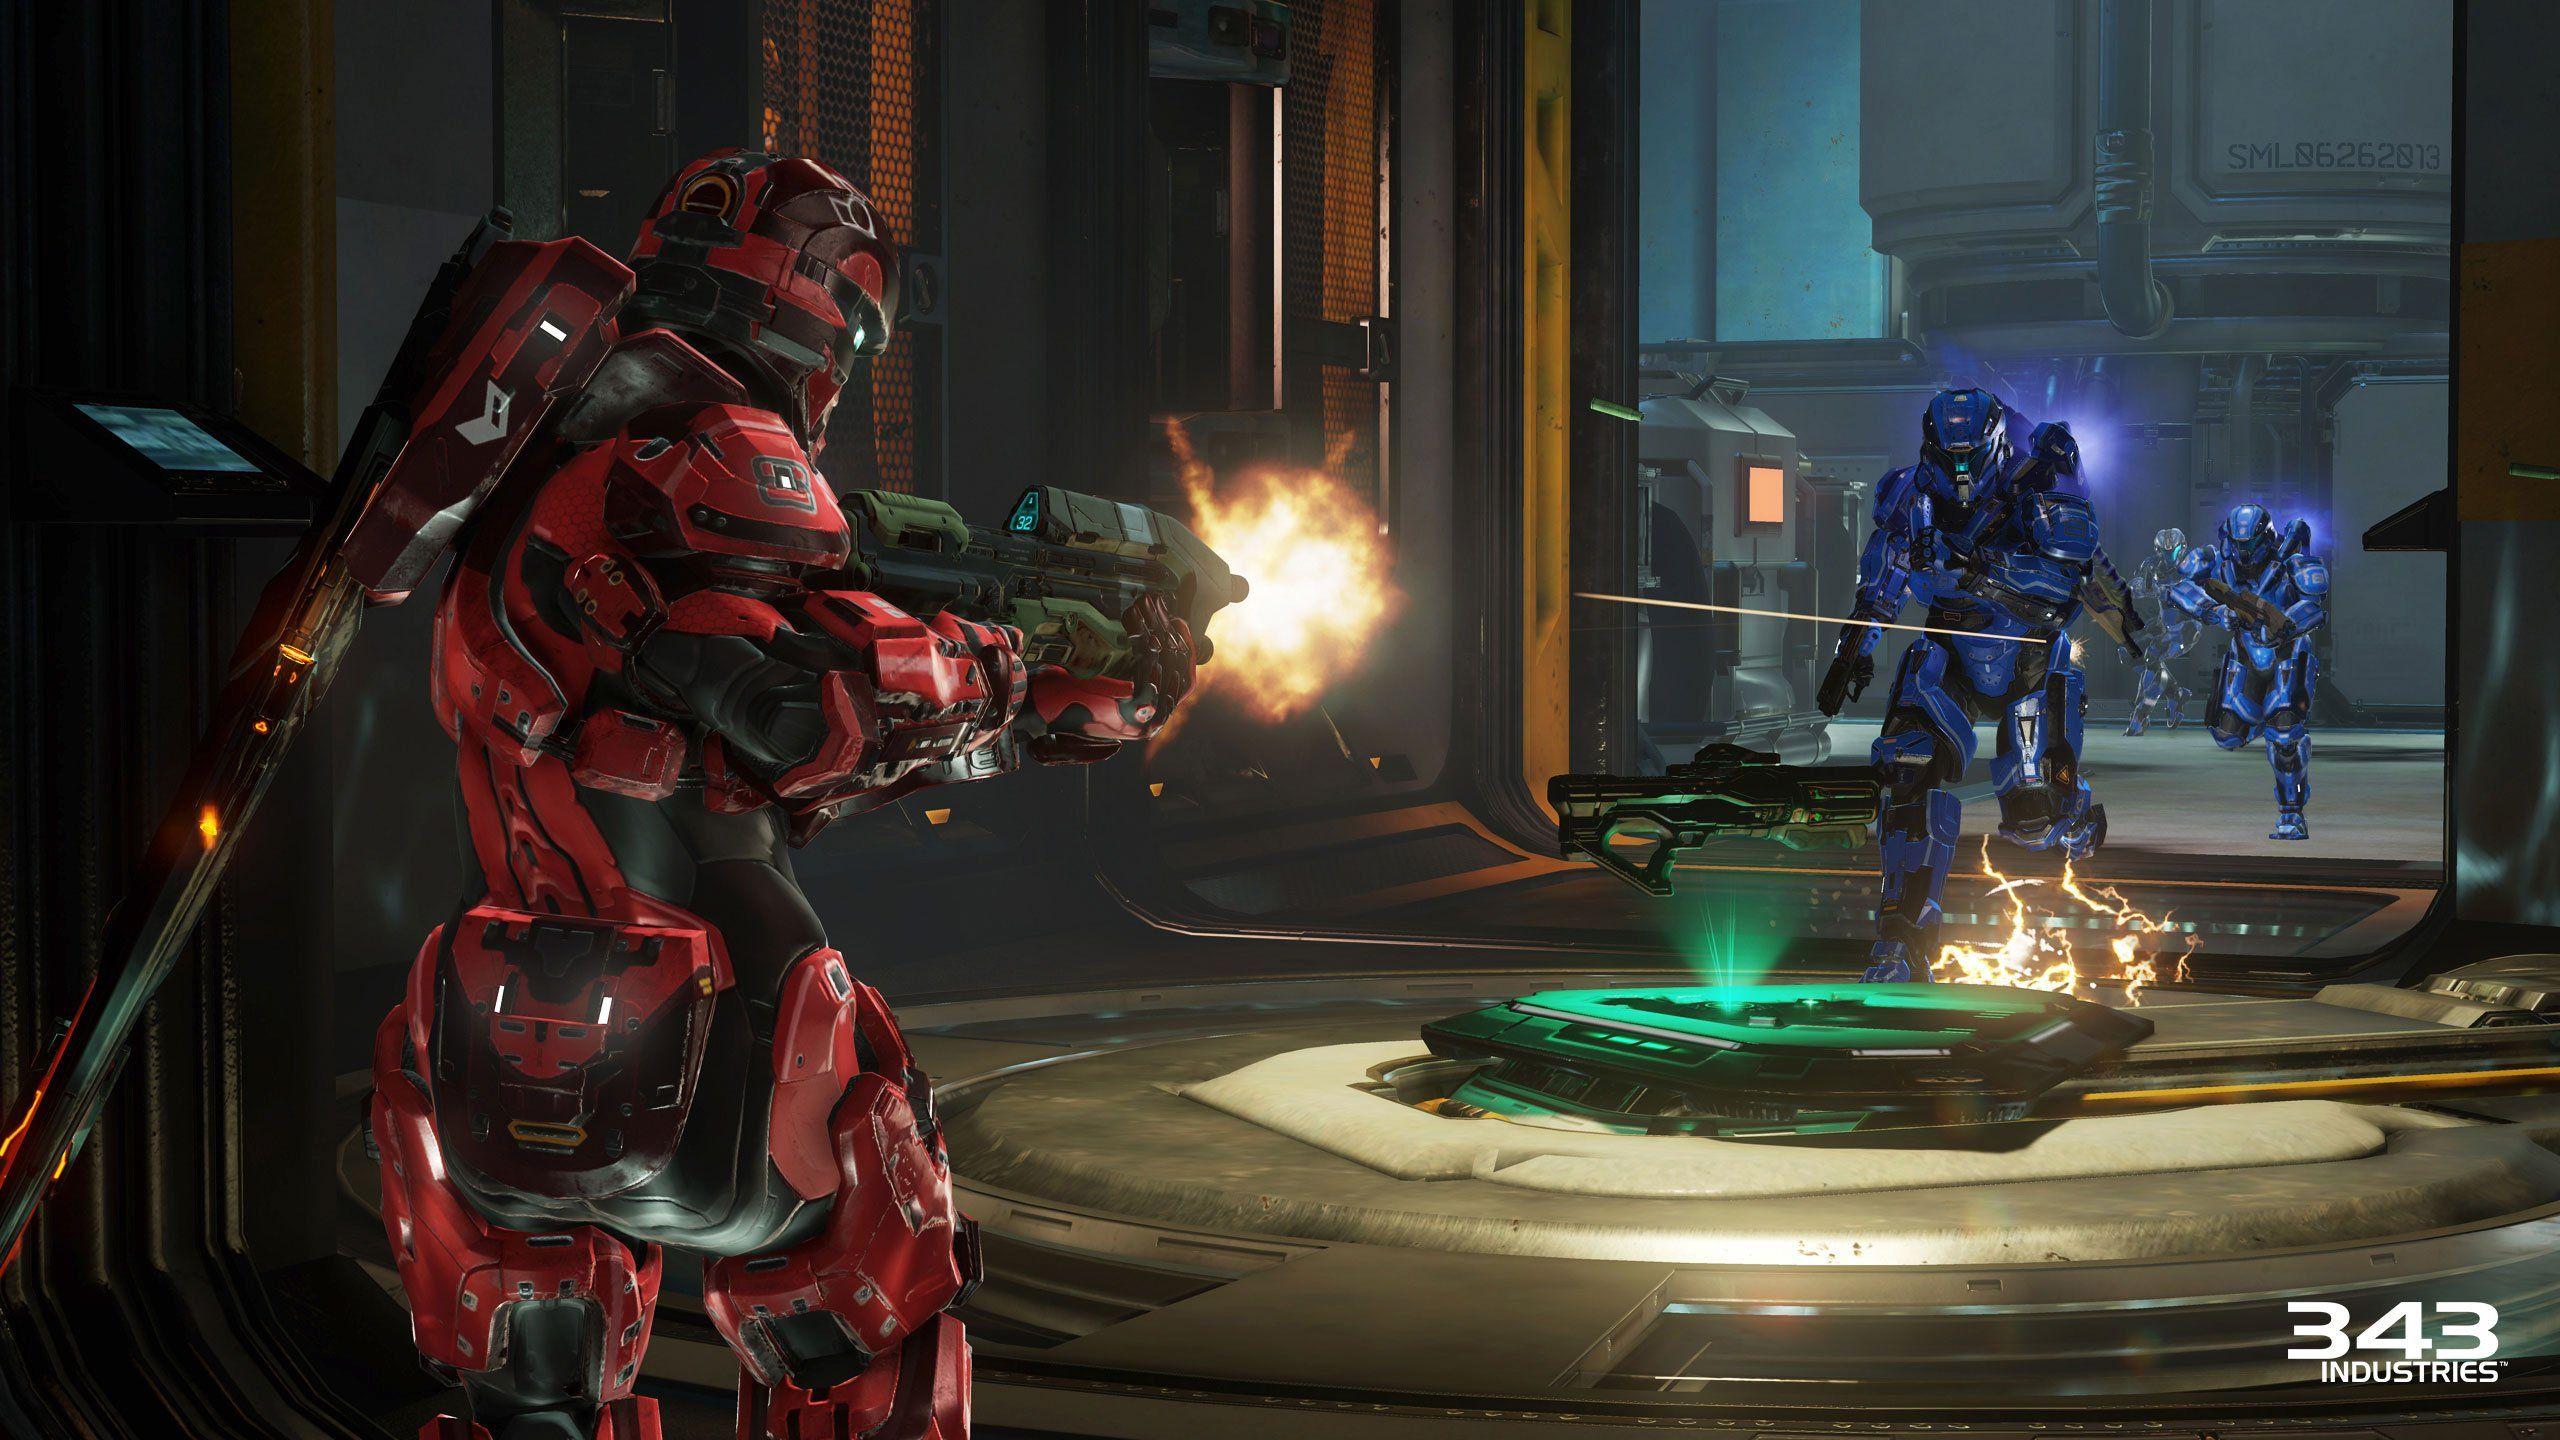 Halo Reach eldstrid matchmaking solo Astro A50 krok upp till PC